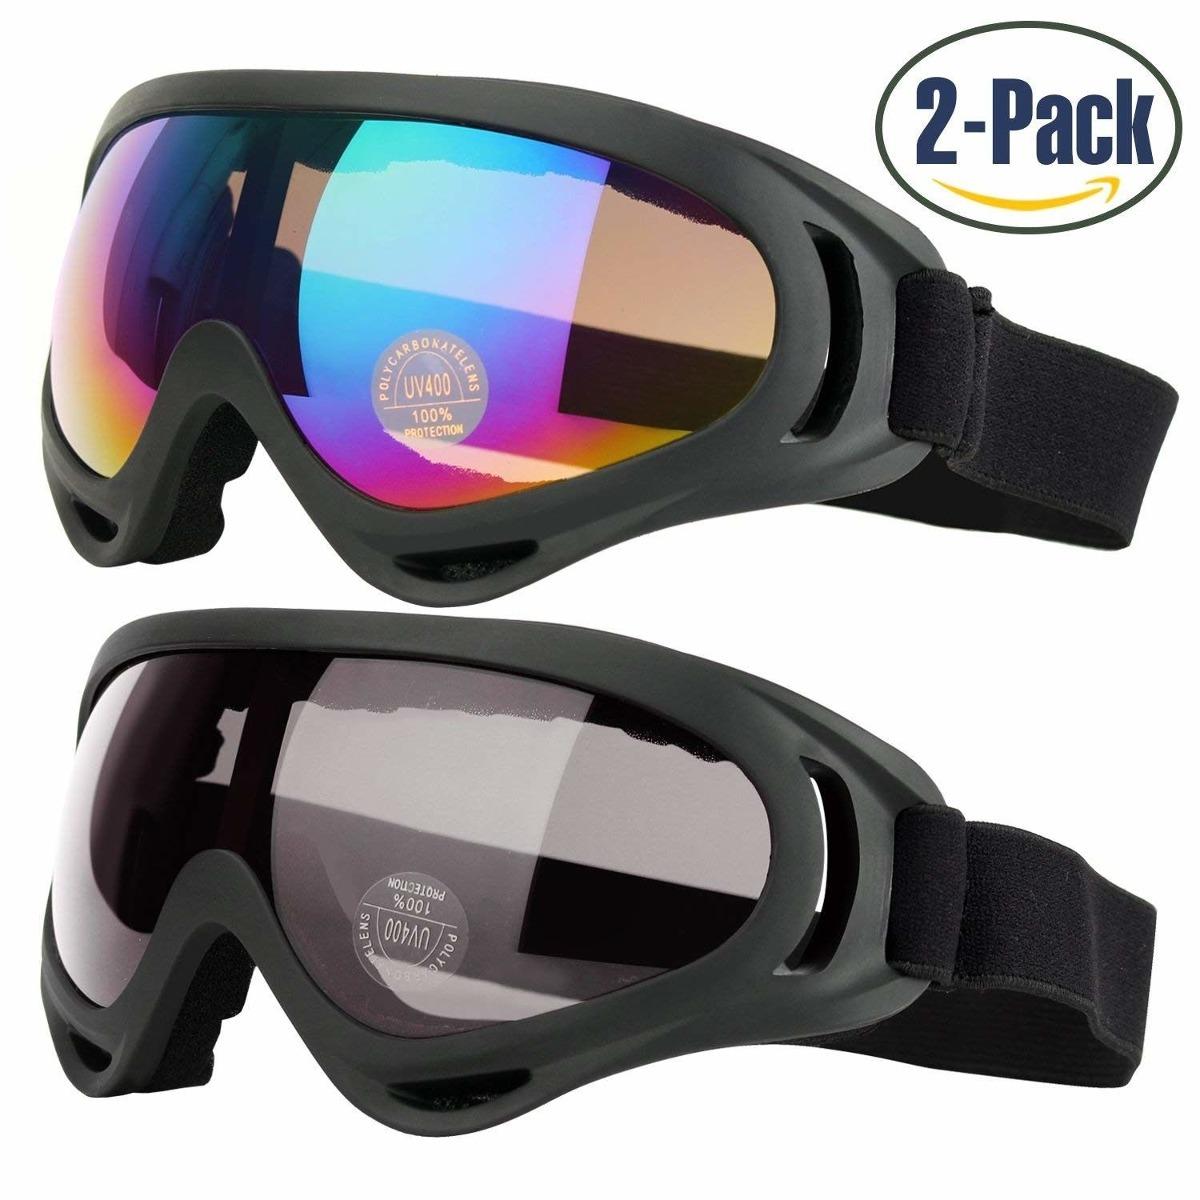 ba38dd1528 gafas jet ski polarizadas 2 pack gafas motocicleta niños ch. Cargando zoom.